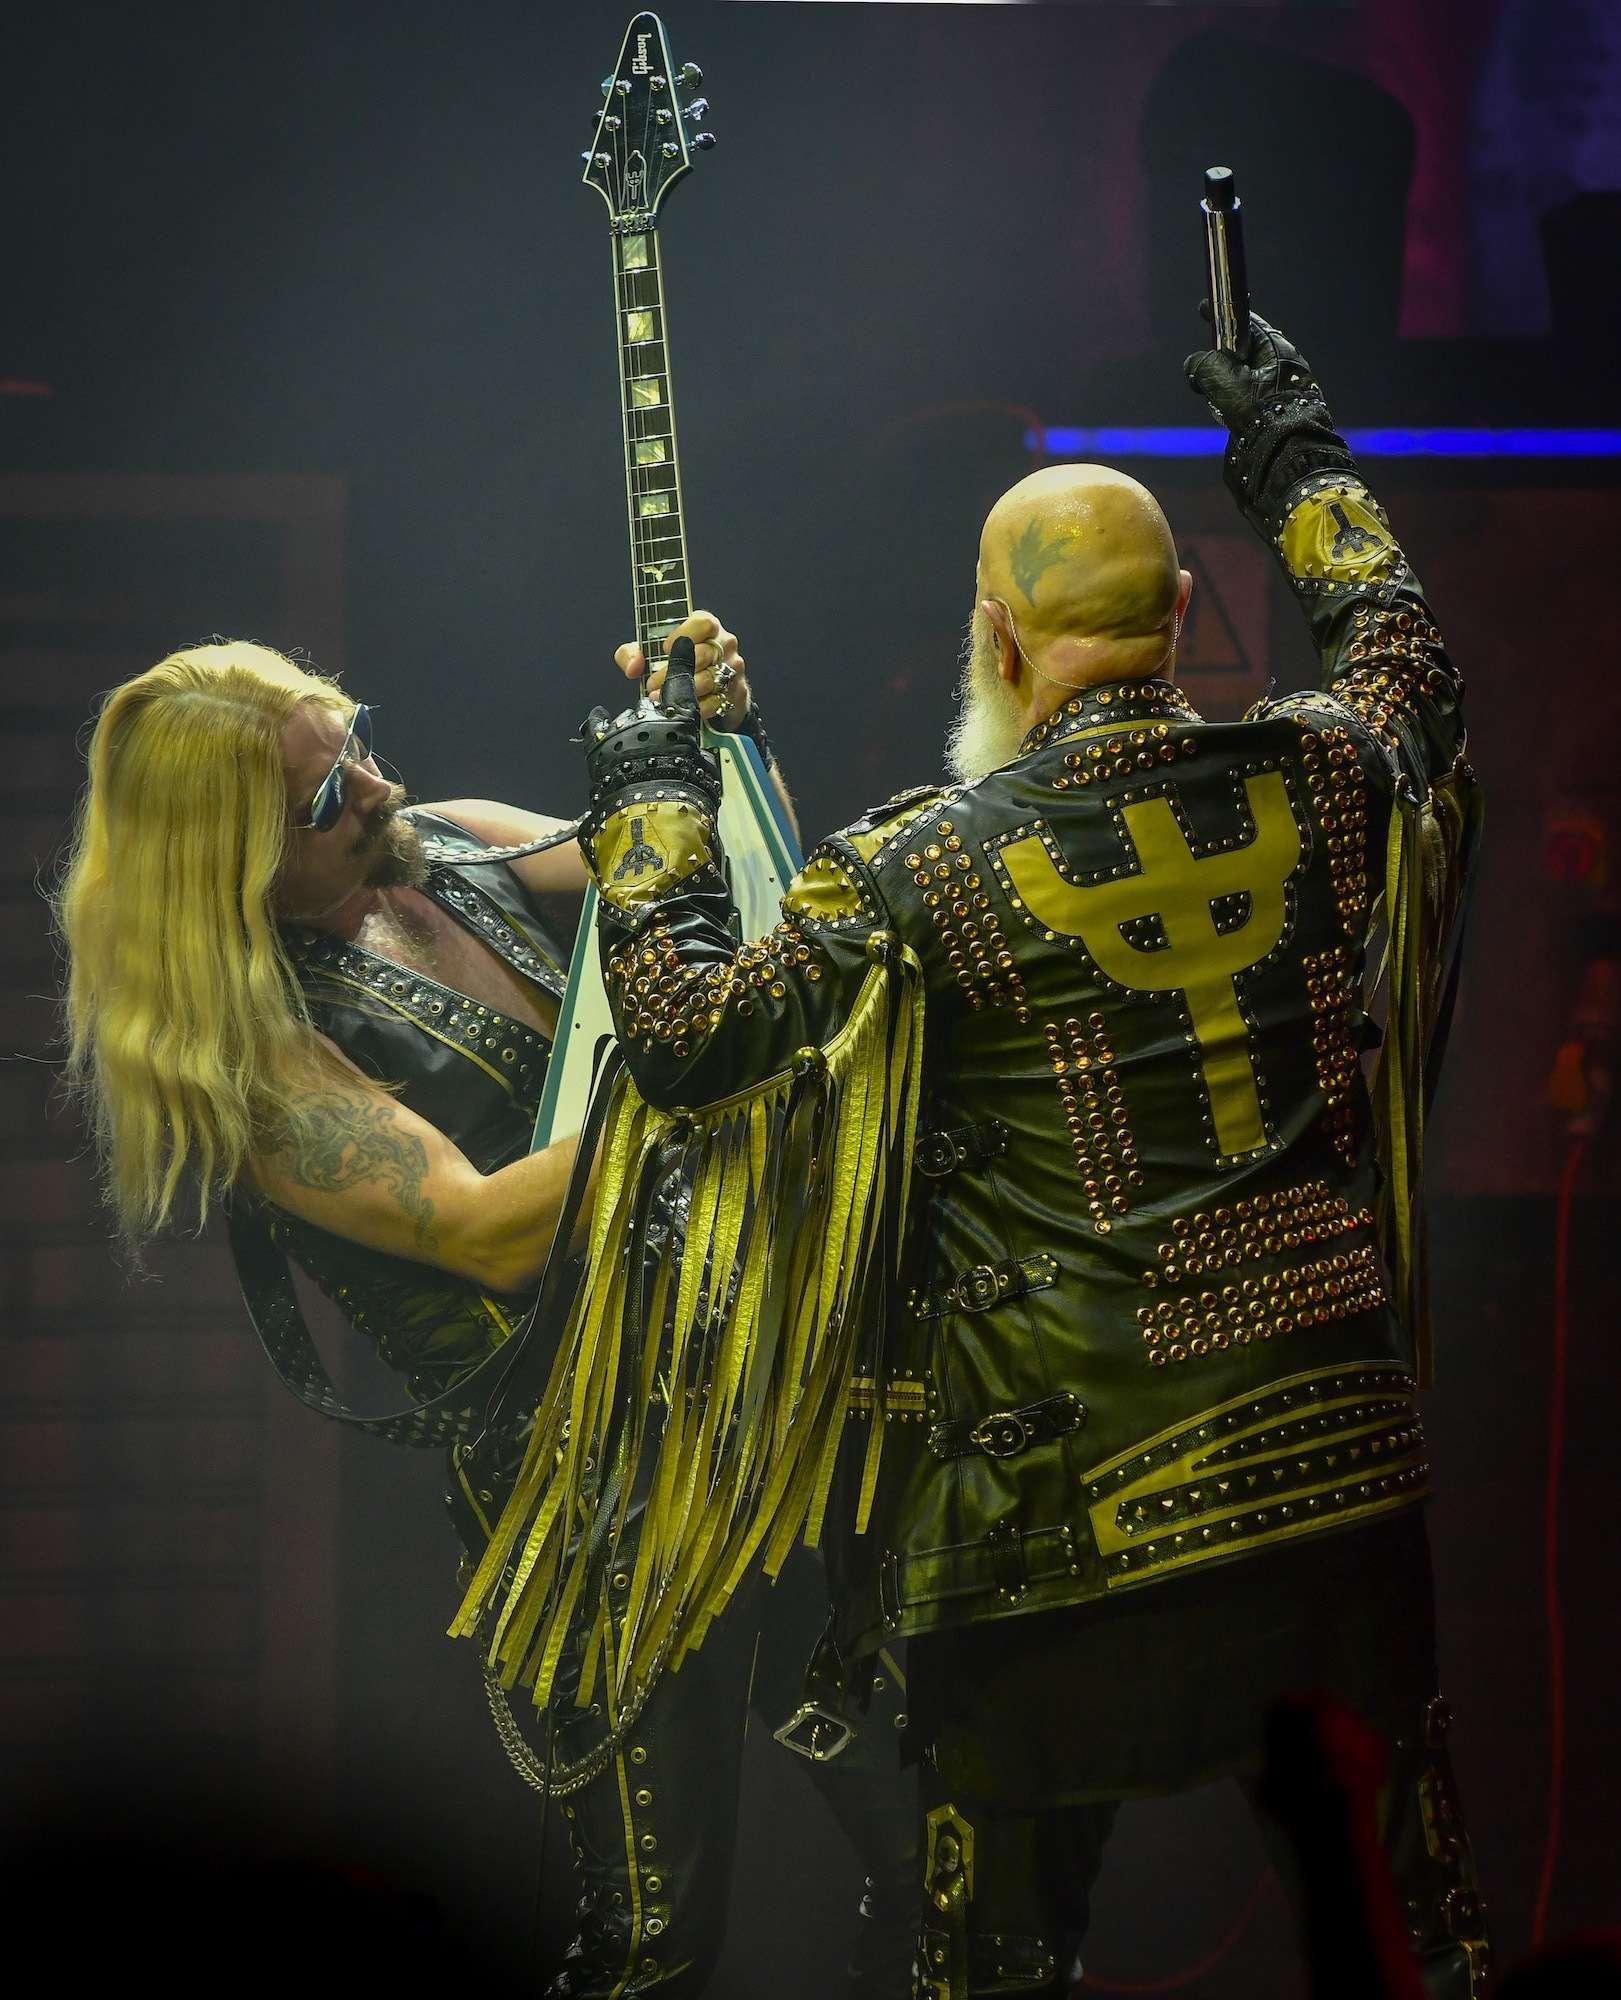 Judas Priest Live at Rosemont Theatre [GALLERY] 24